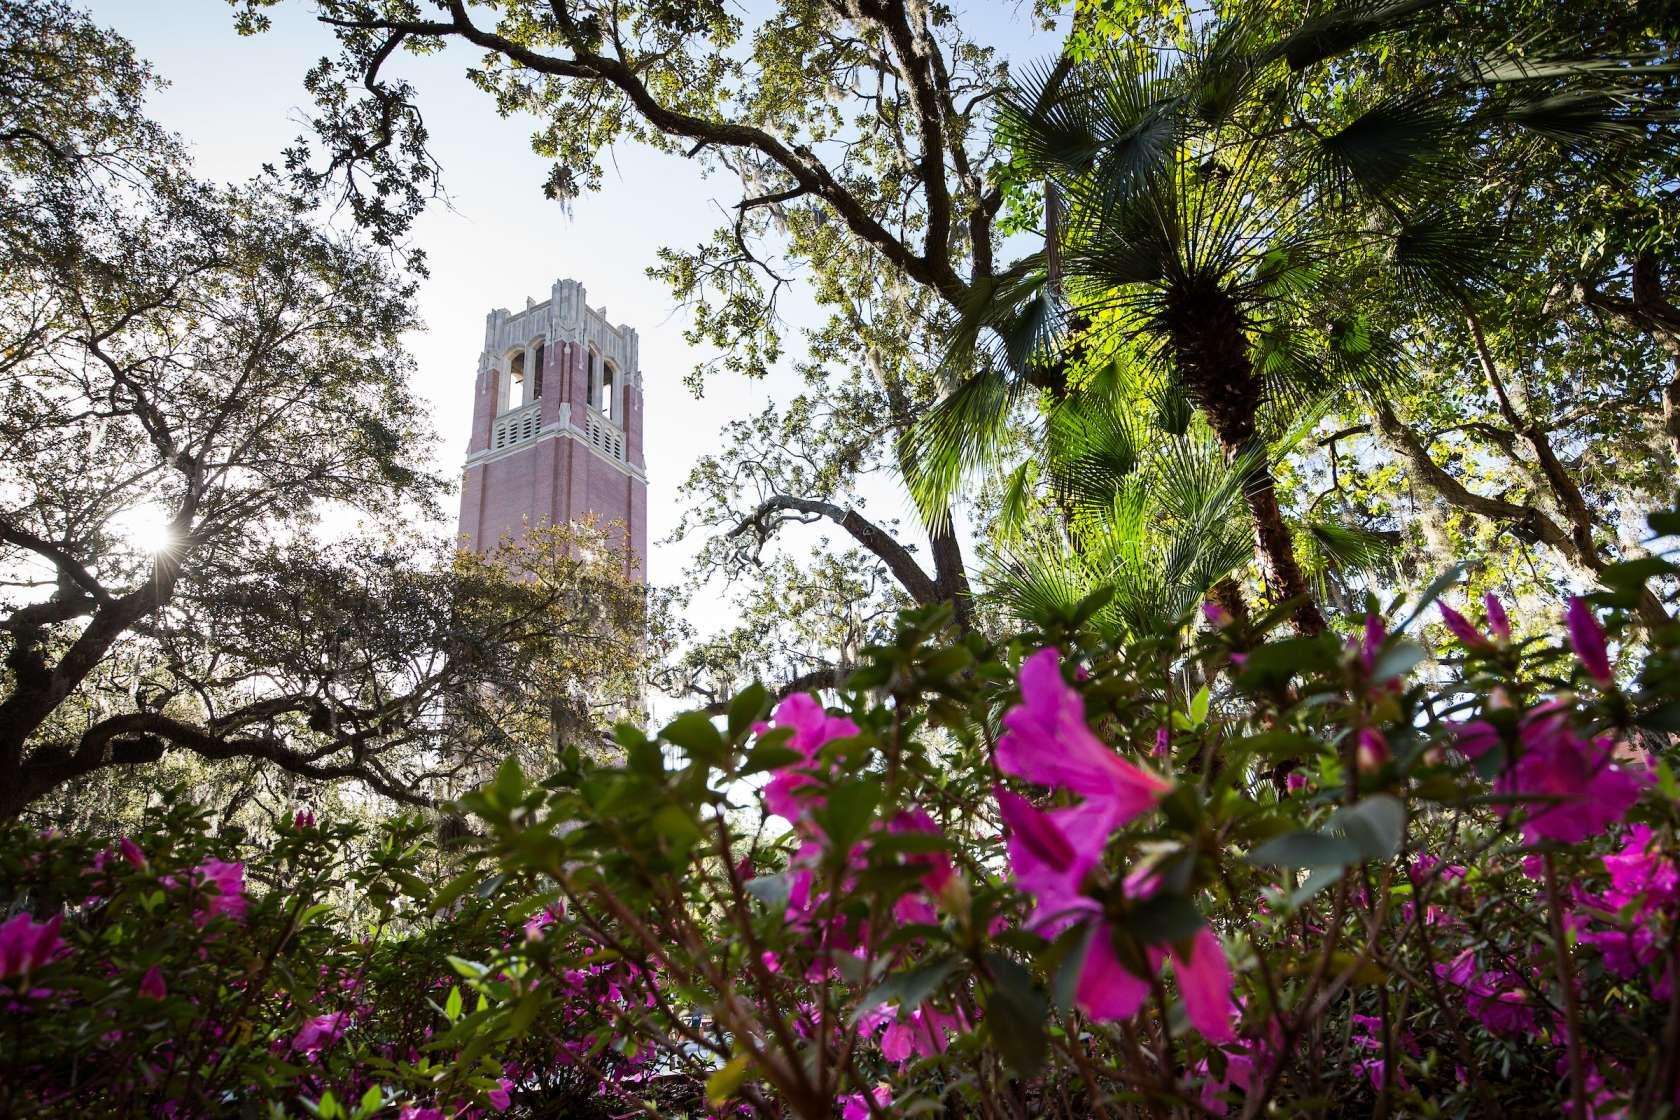 University of Florida's iconic Century Tower surrounded by spring foliage.